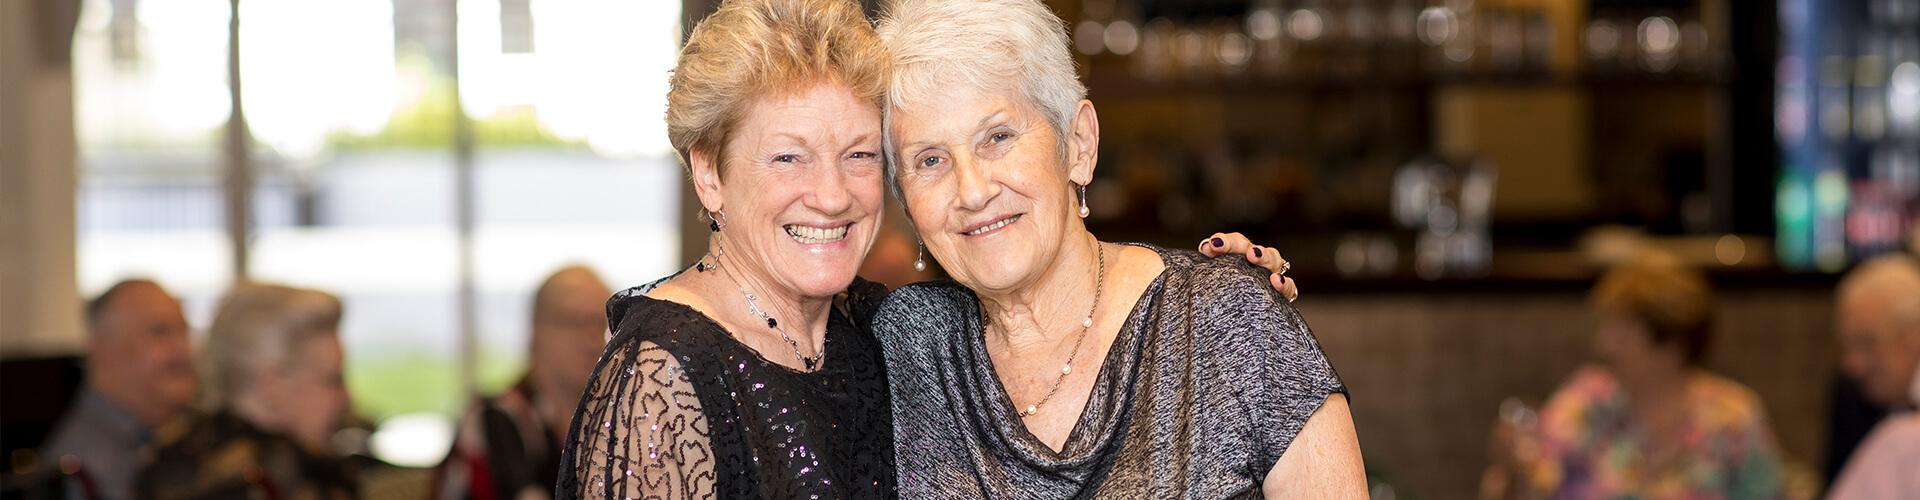 Nellie Melba Two ladies hugging